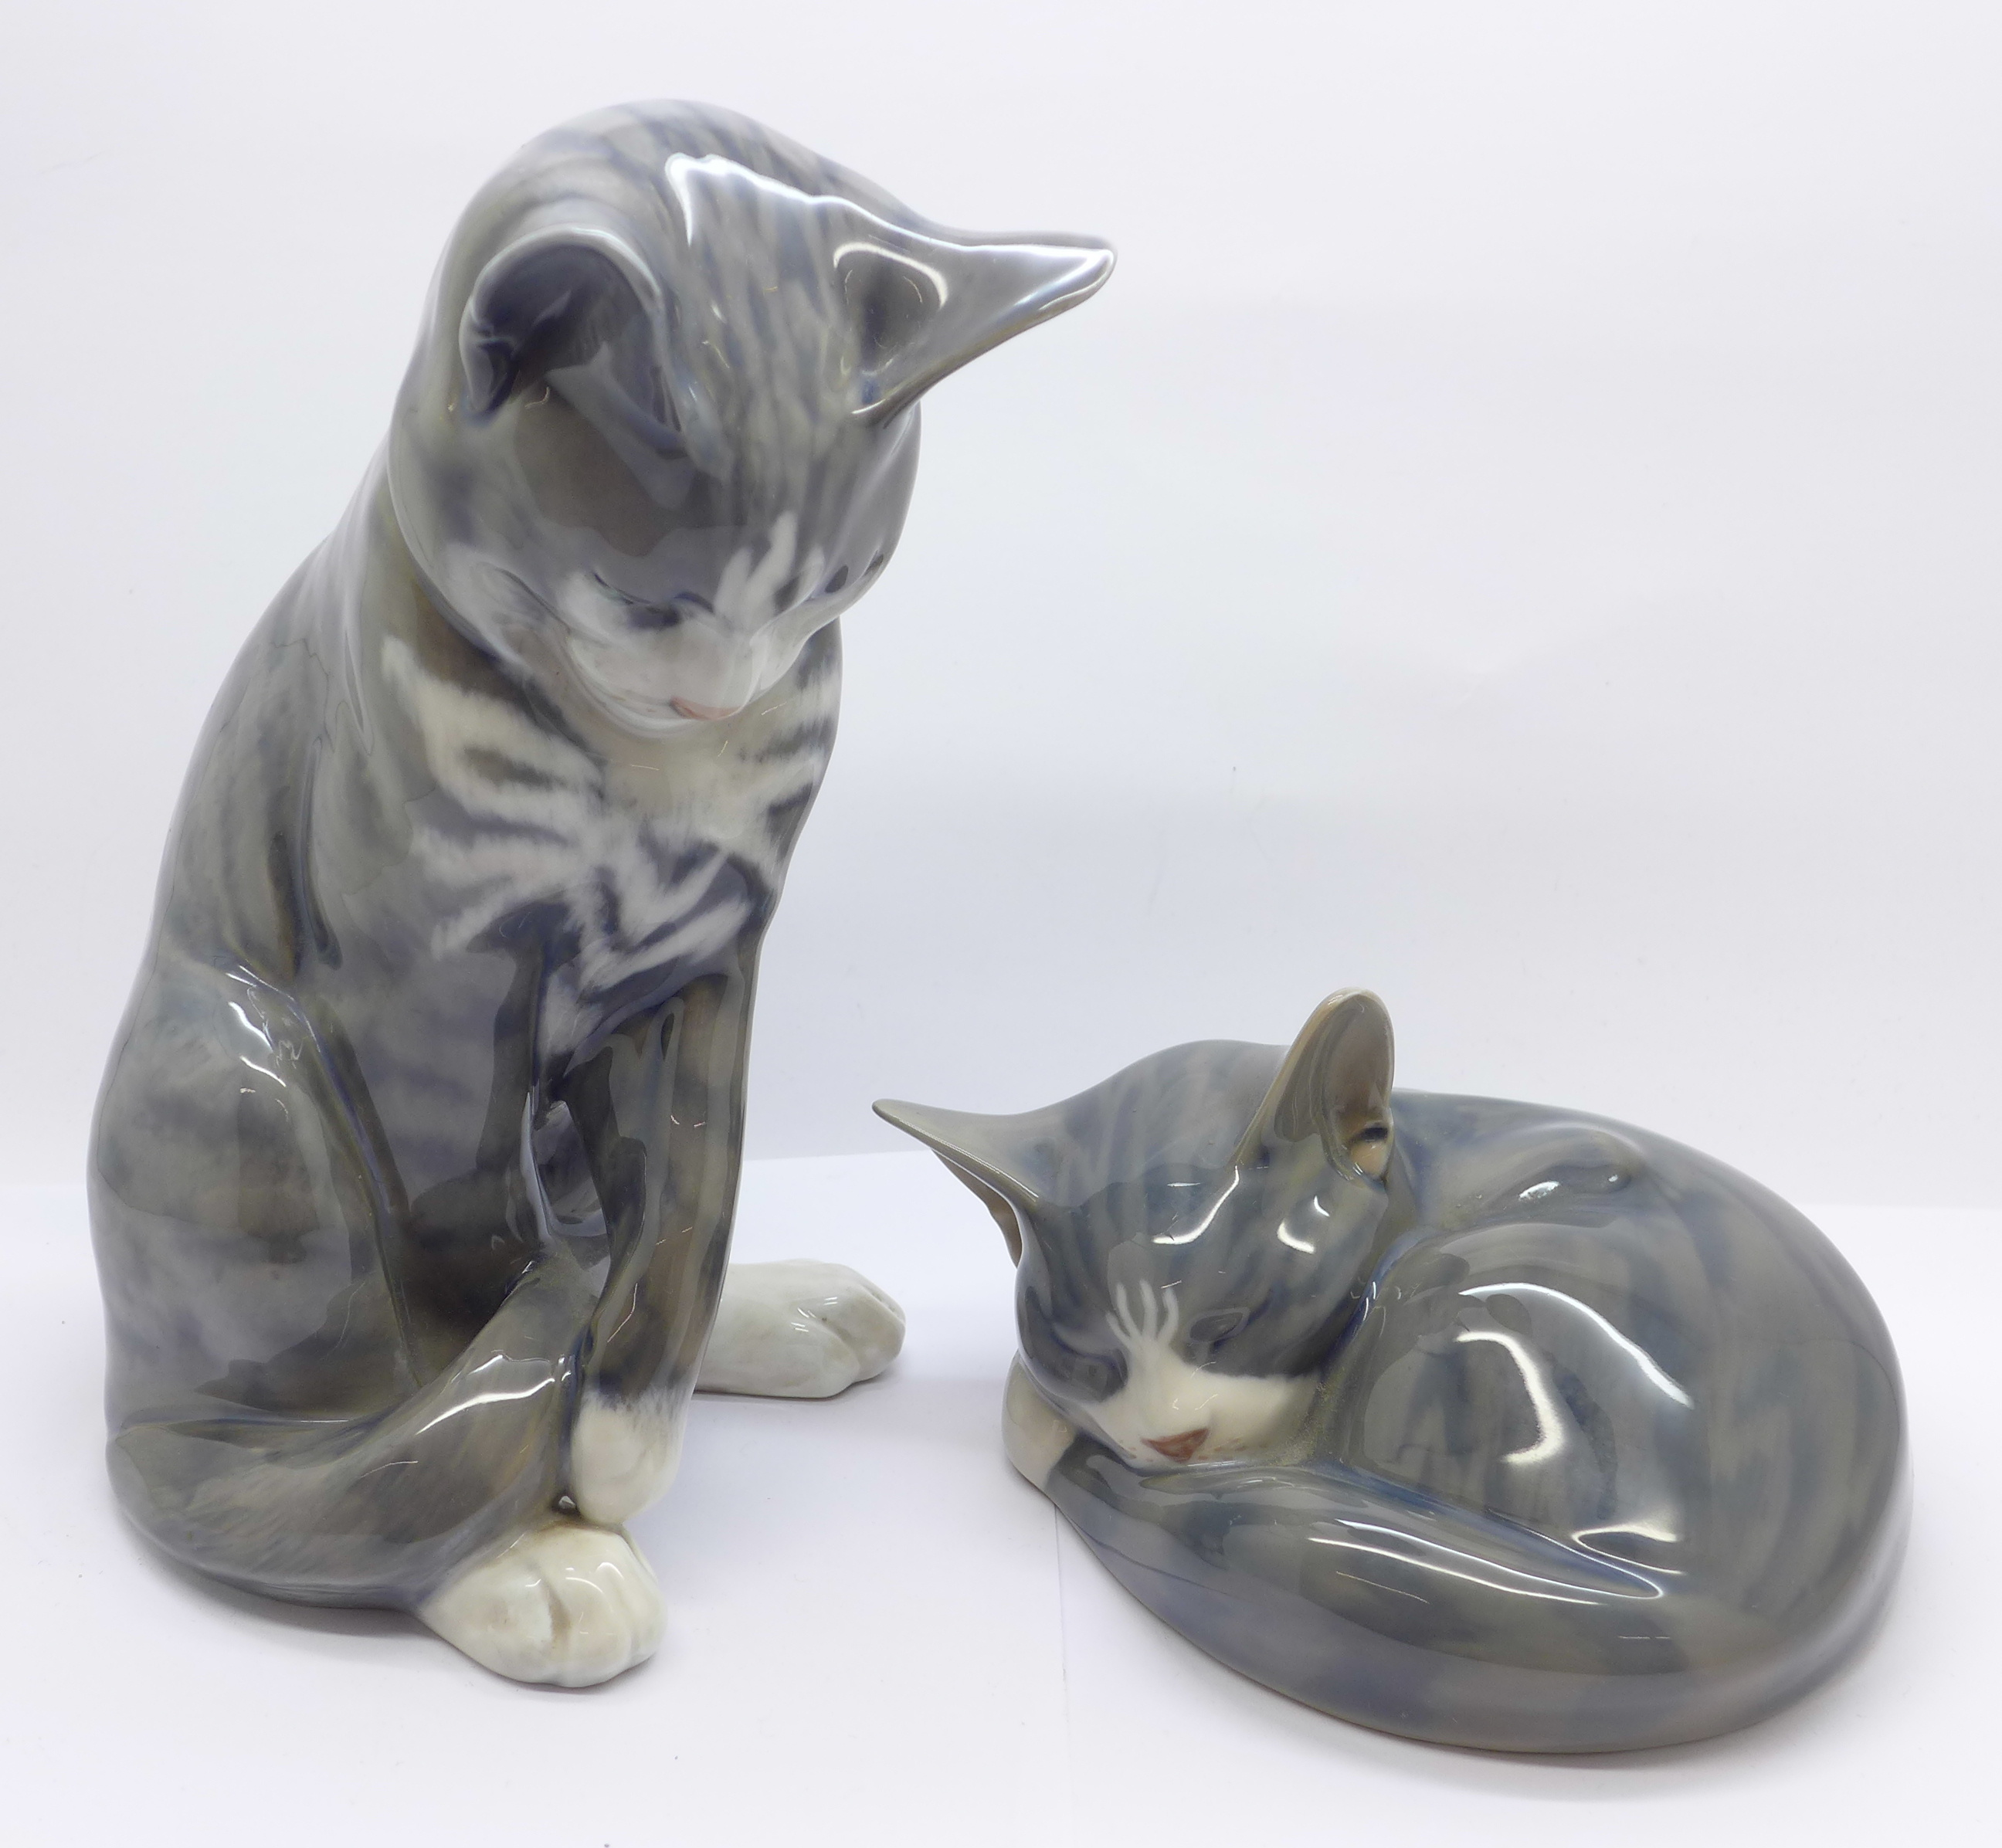 Lot 612 - Two Royal Copenhagen figures of cats, 18.